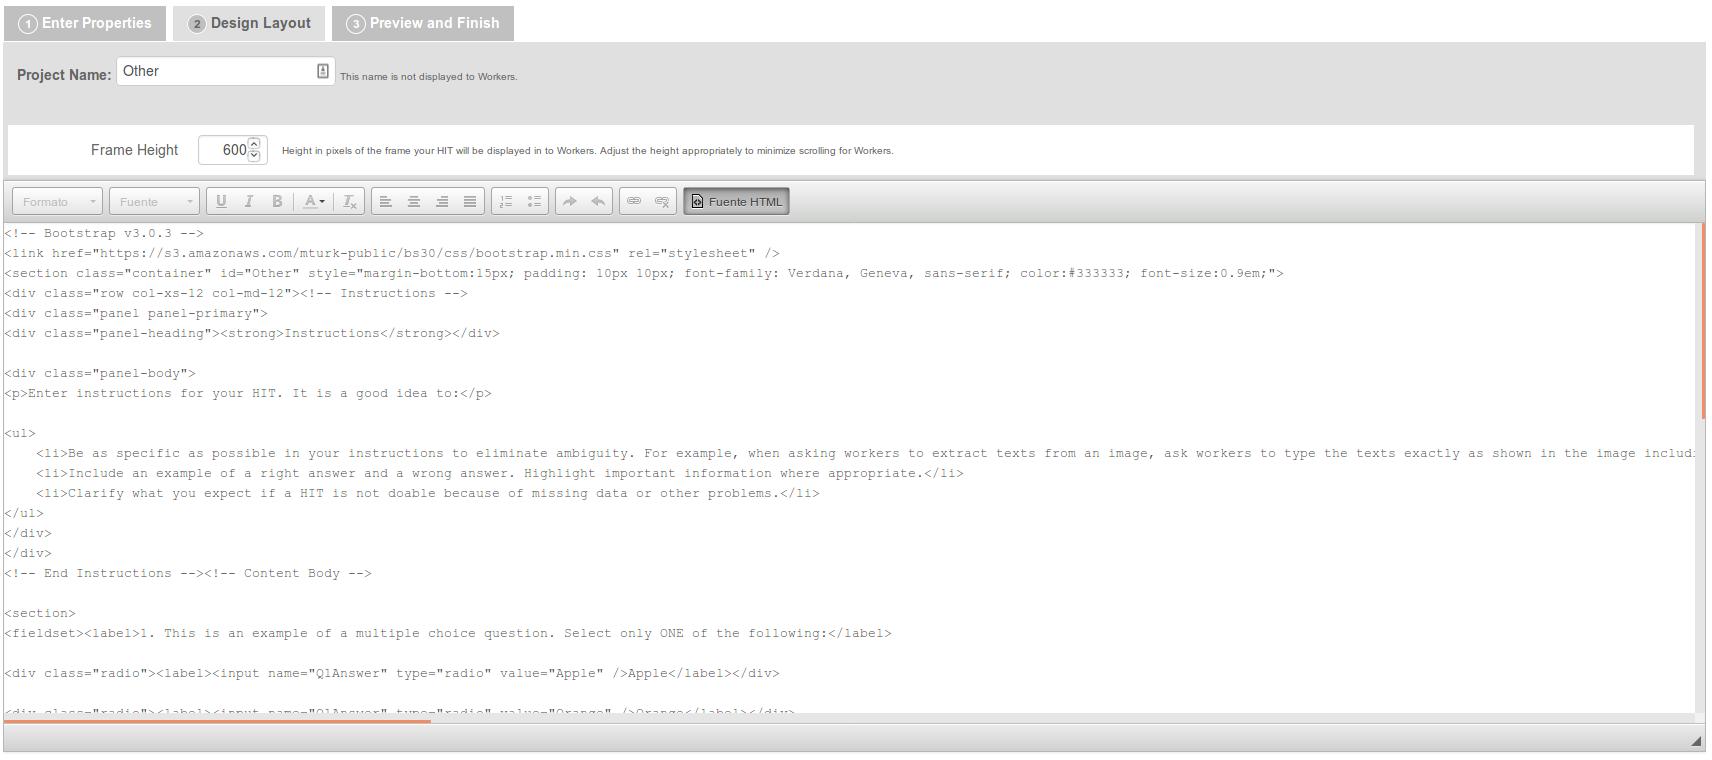 HTML Source on Mechanical Turk